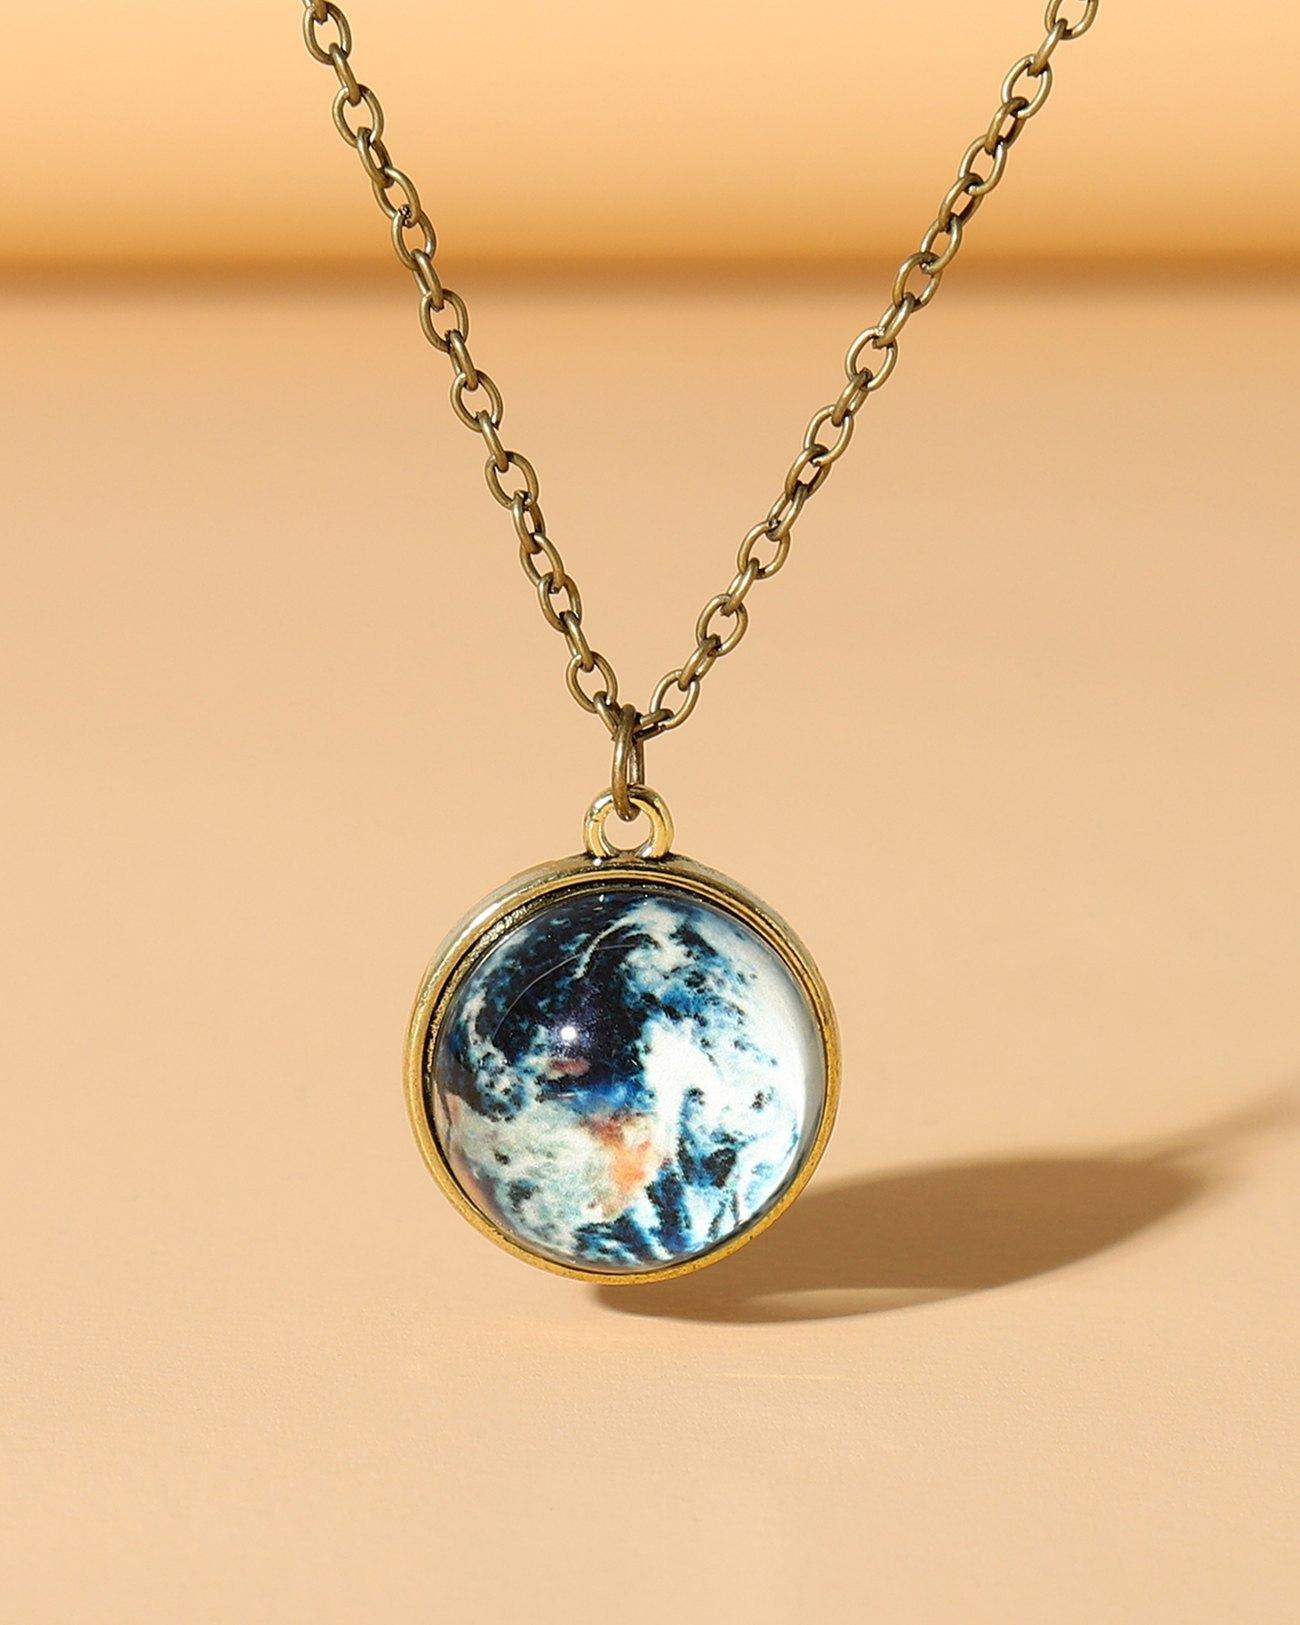 Beach Wind Luminous Ocean Drop Necklace - Blue ONE SIZE